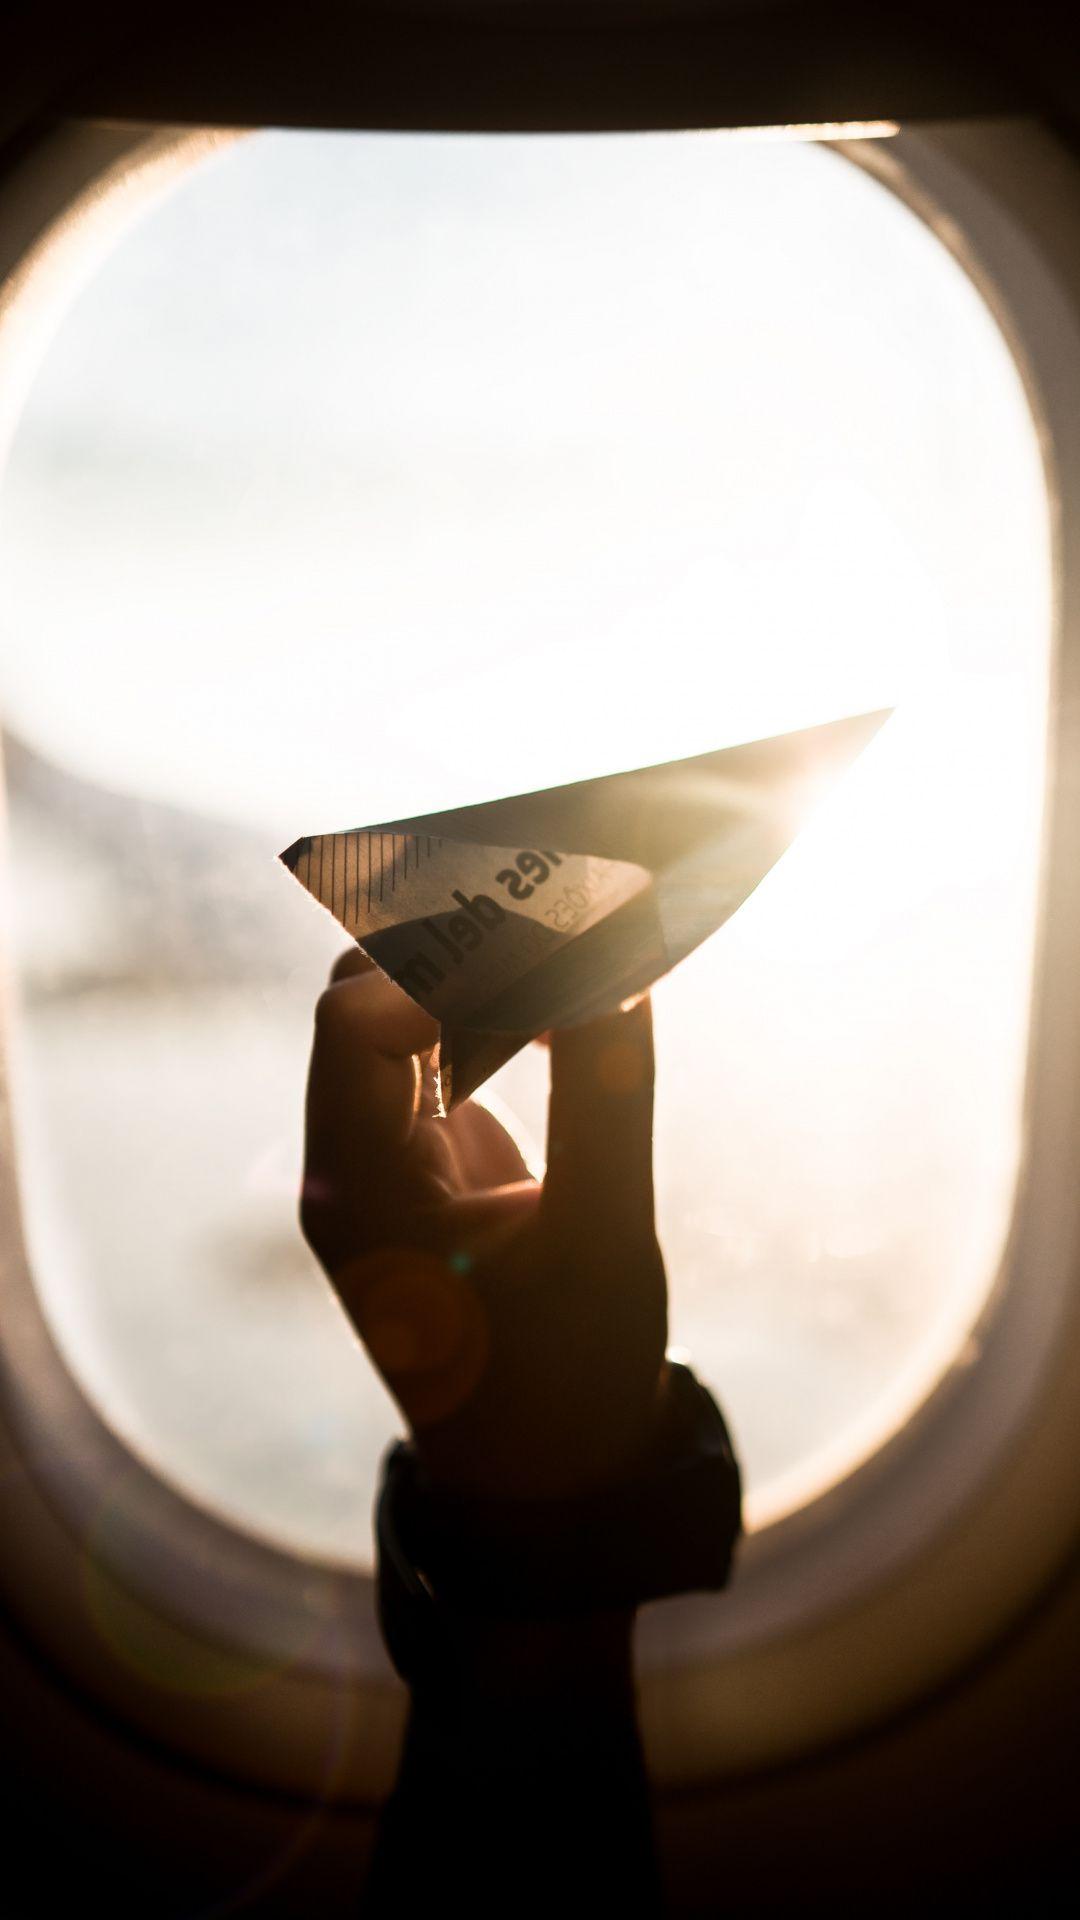 Wallpapers passenger, flight, hand, airline, paper plane